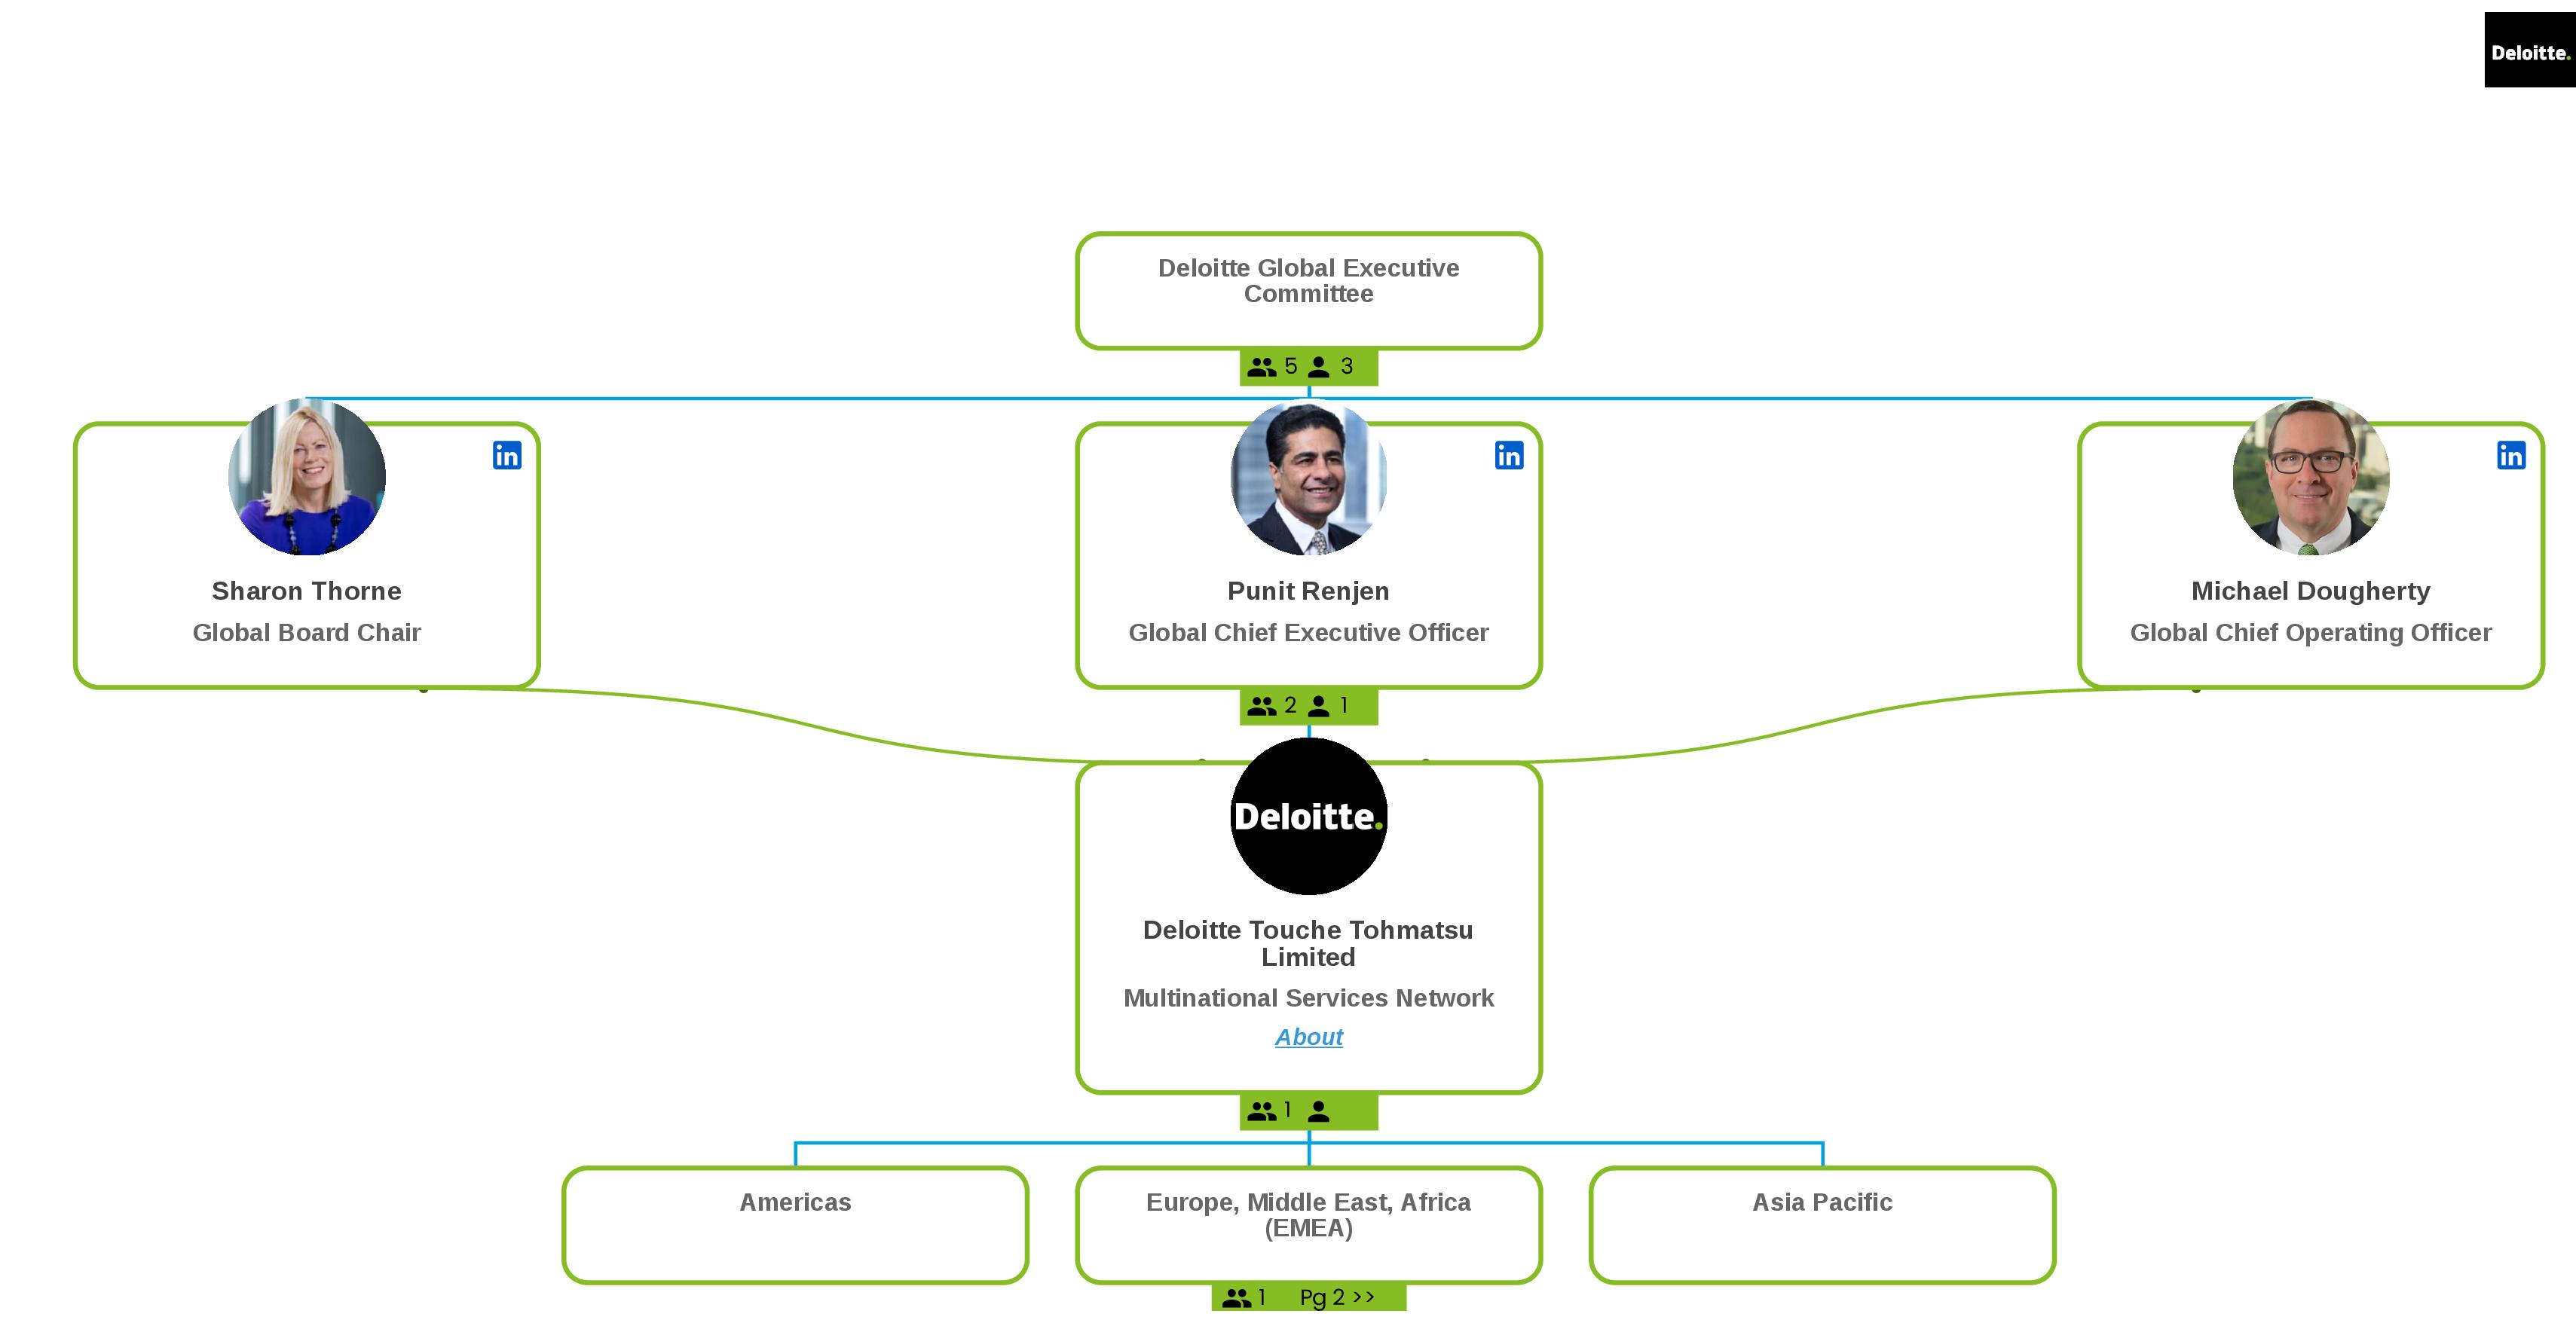 Deloitte's Organizational Structure